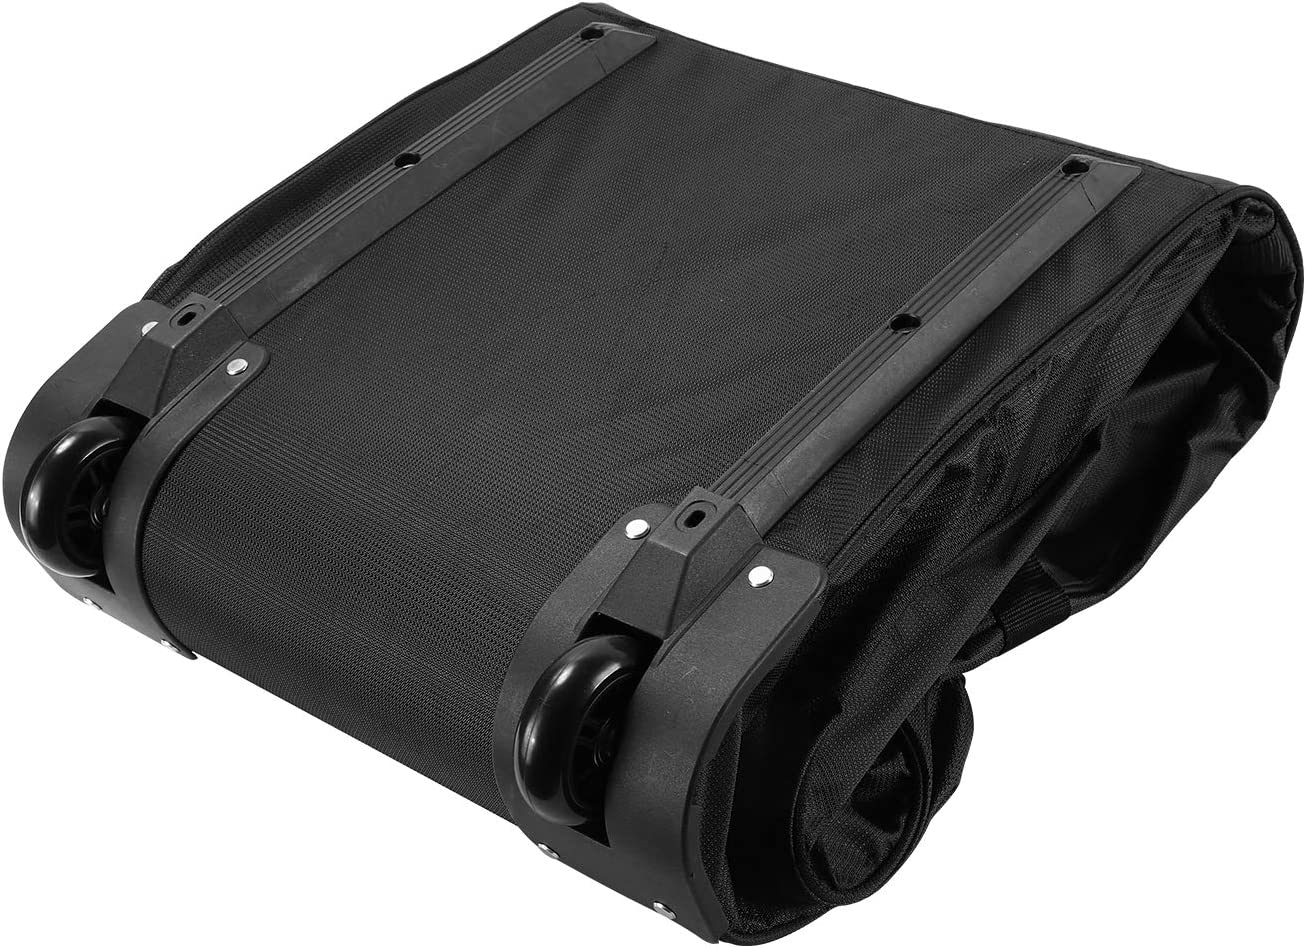 LONGCHAO Golf Travel Cover Foldable Golf Bag Portable Golf ...